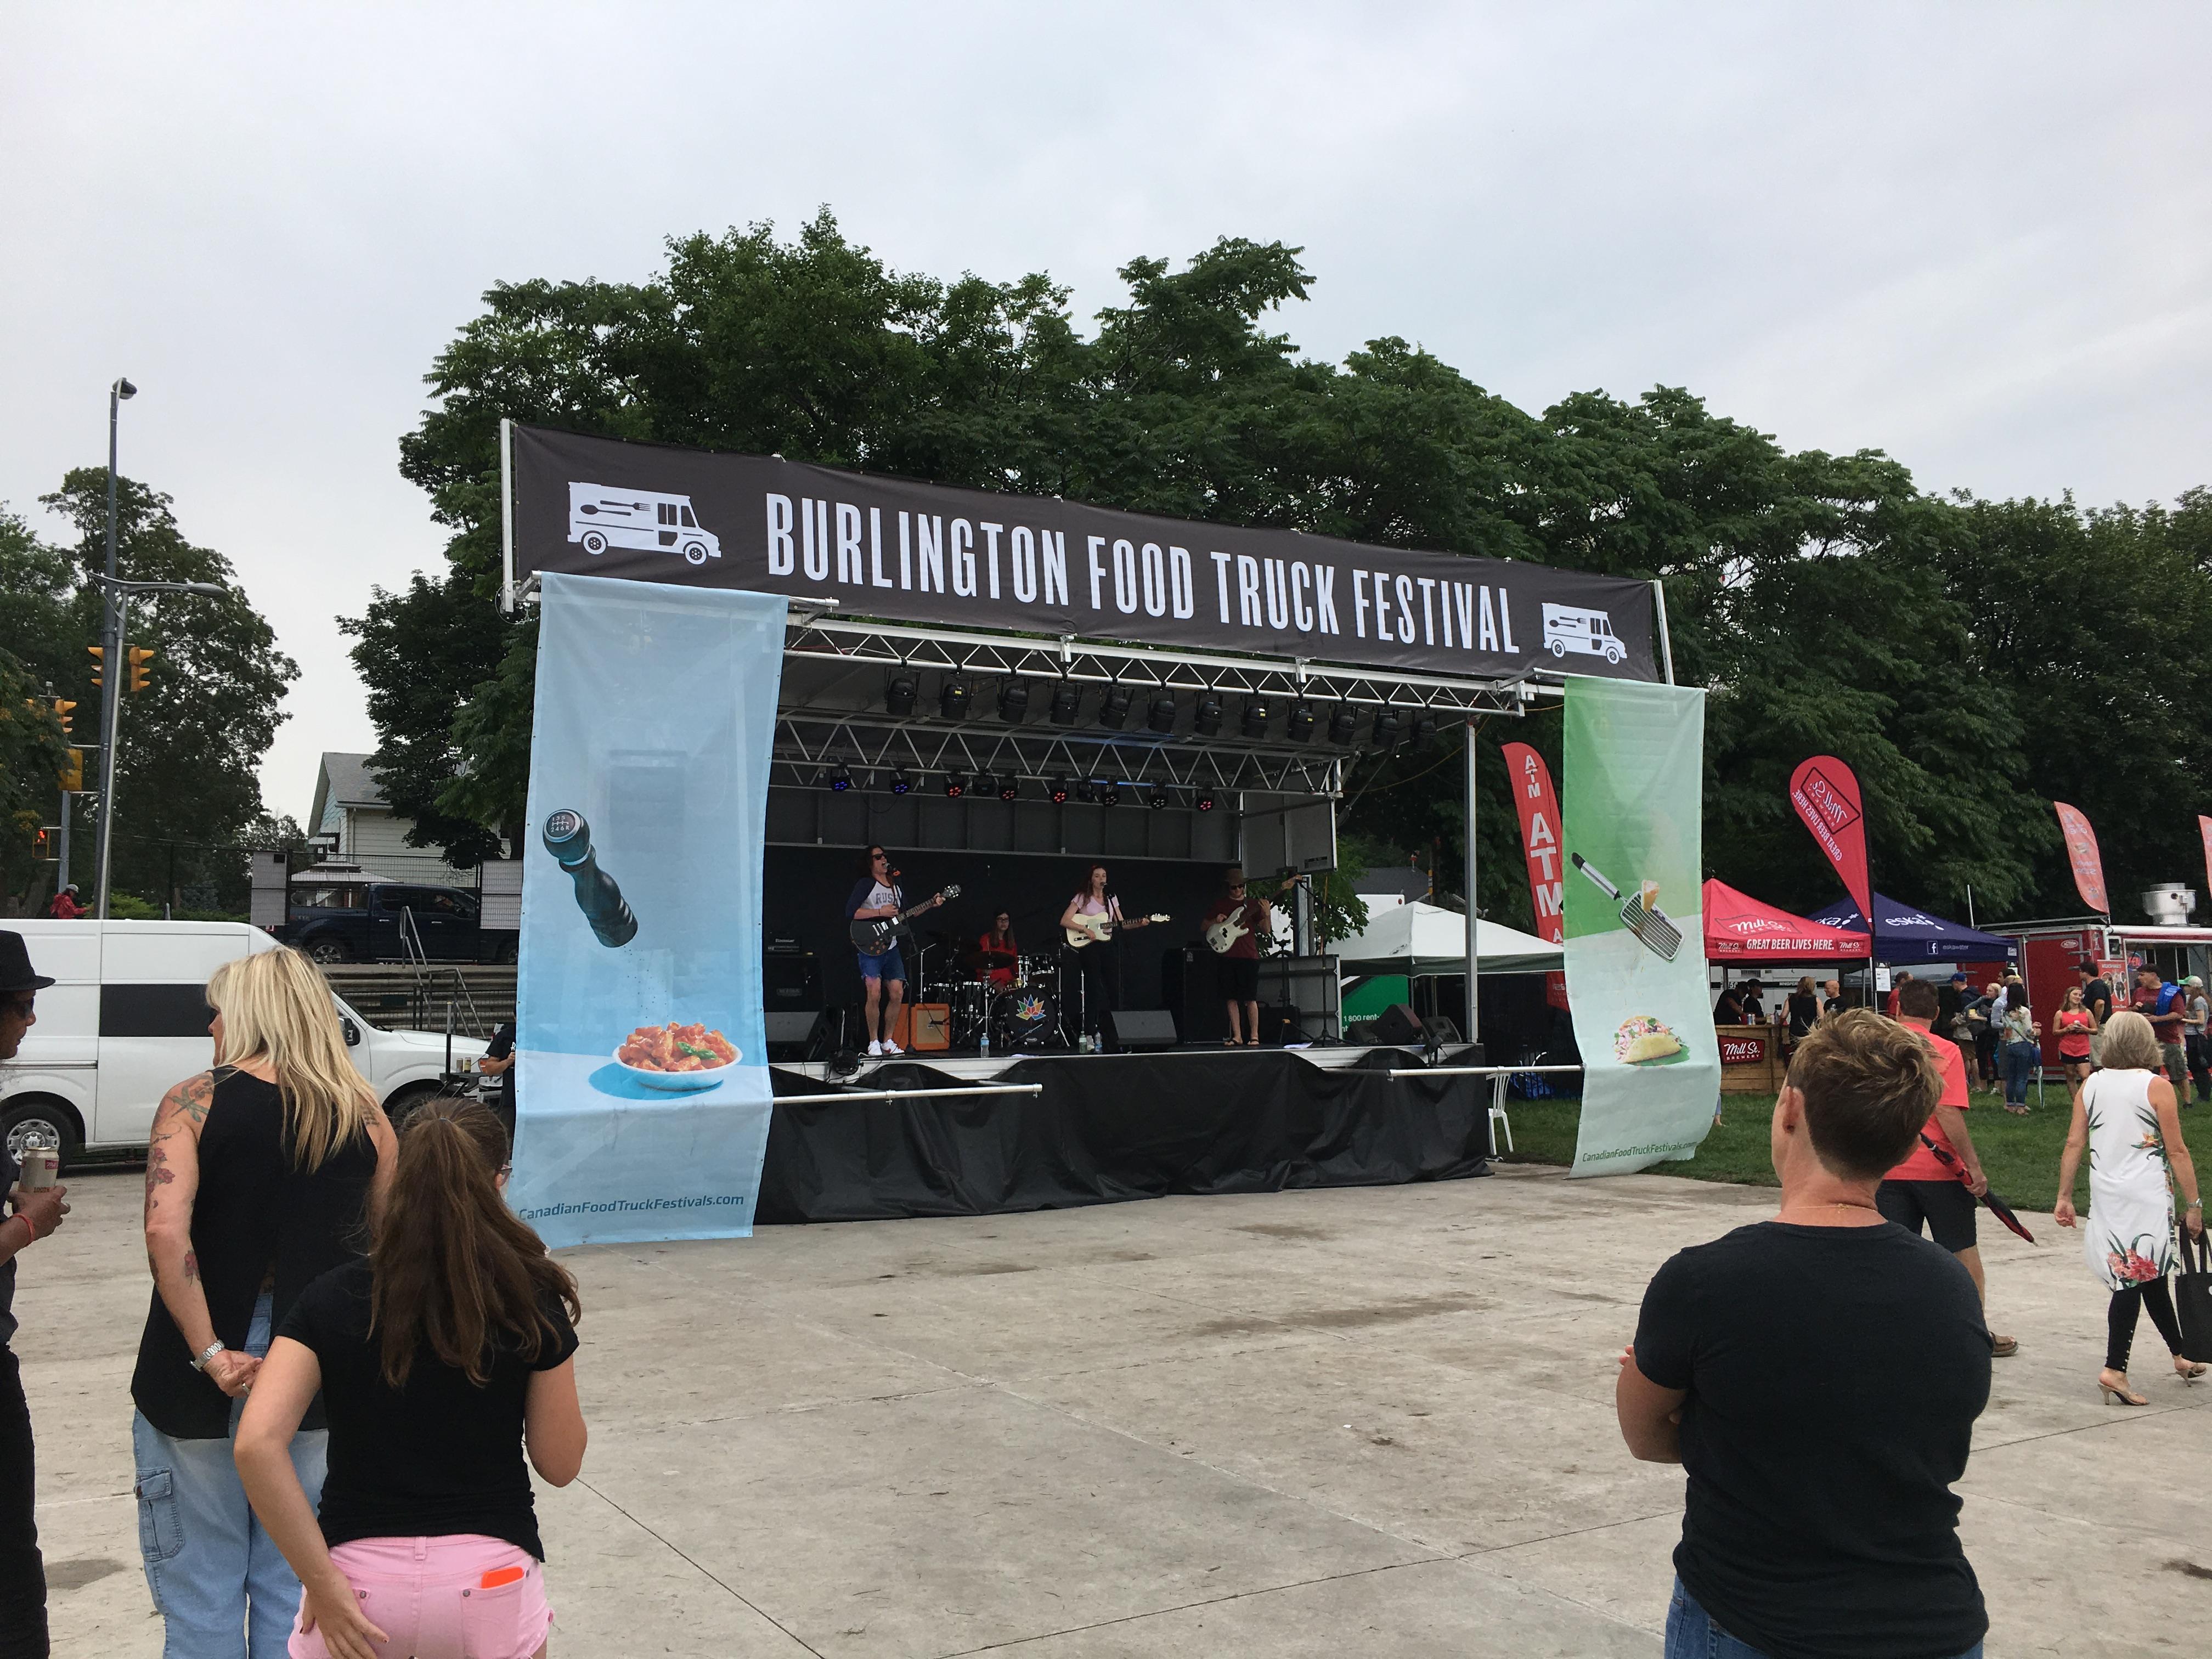 Burlington Food Truck Festival 2017